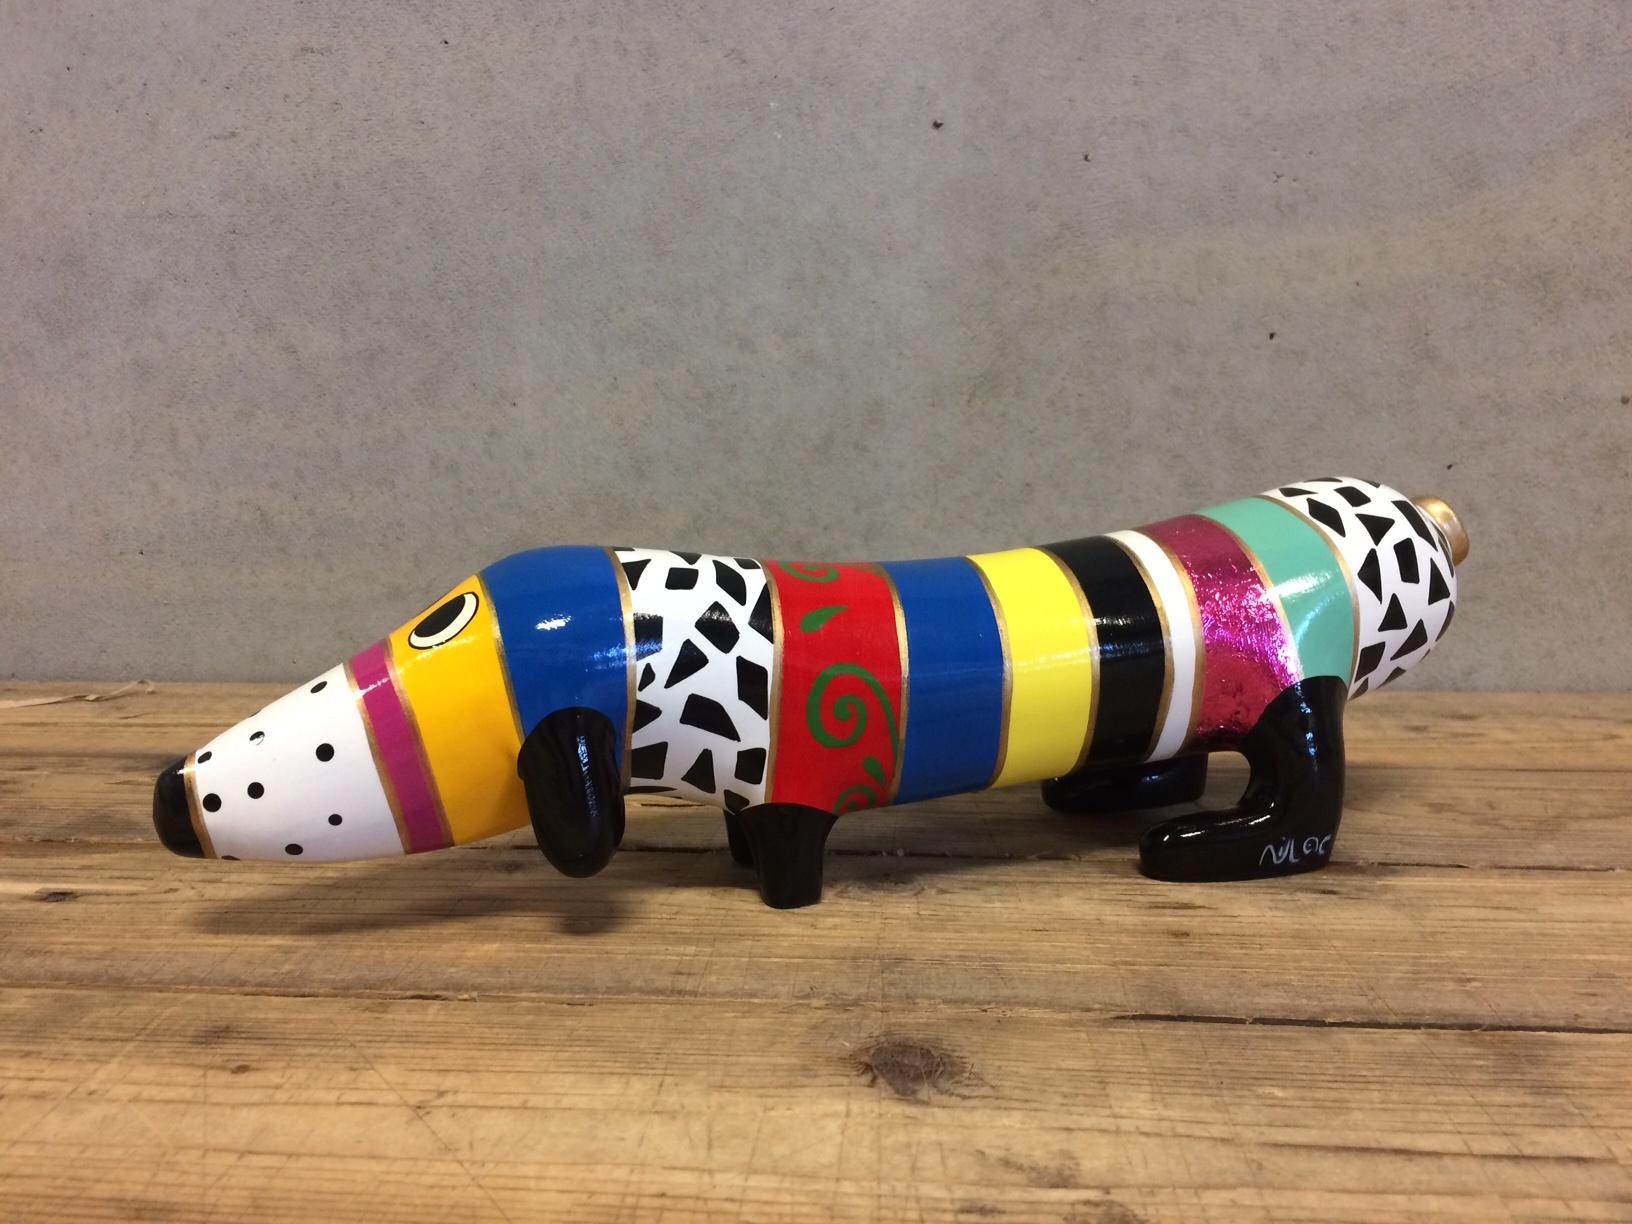 Niloc Pagen Hot Dog Fantasy - L15/ L30/ L86 cm